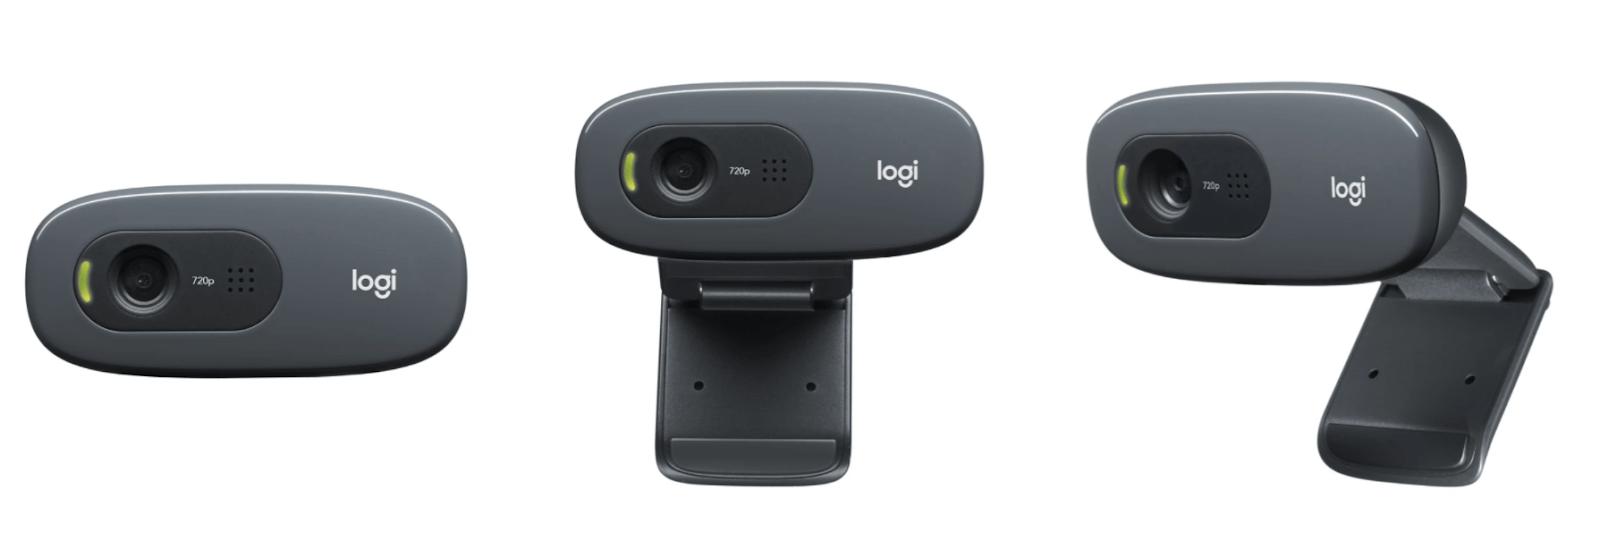 Harga Logitech Webcam Software C270